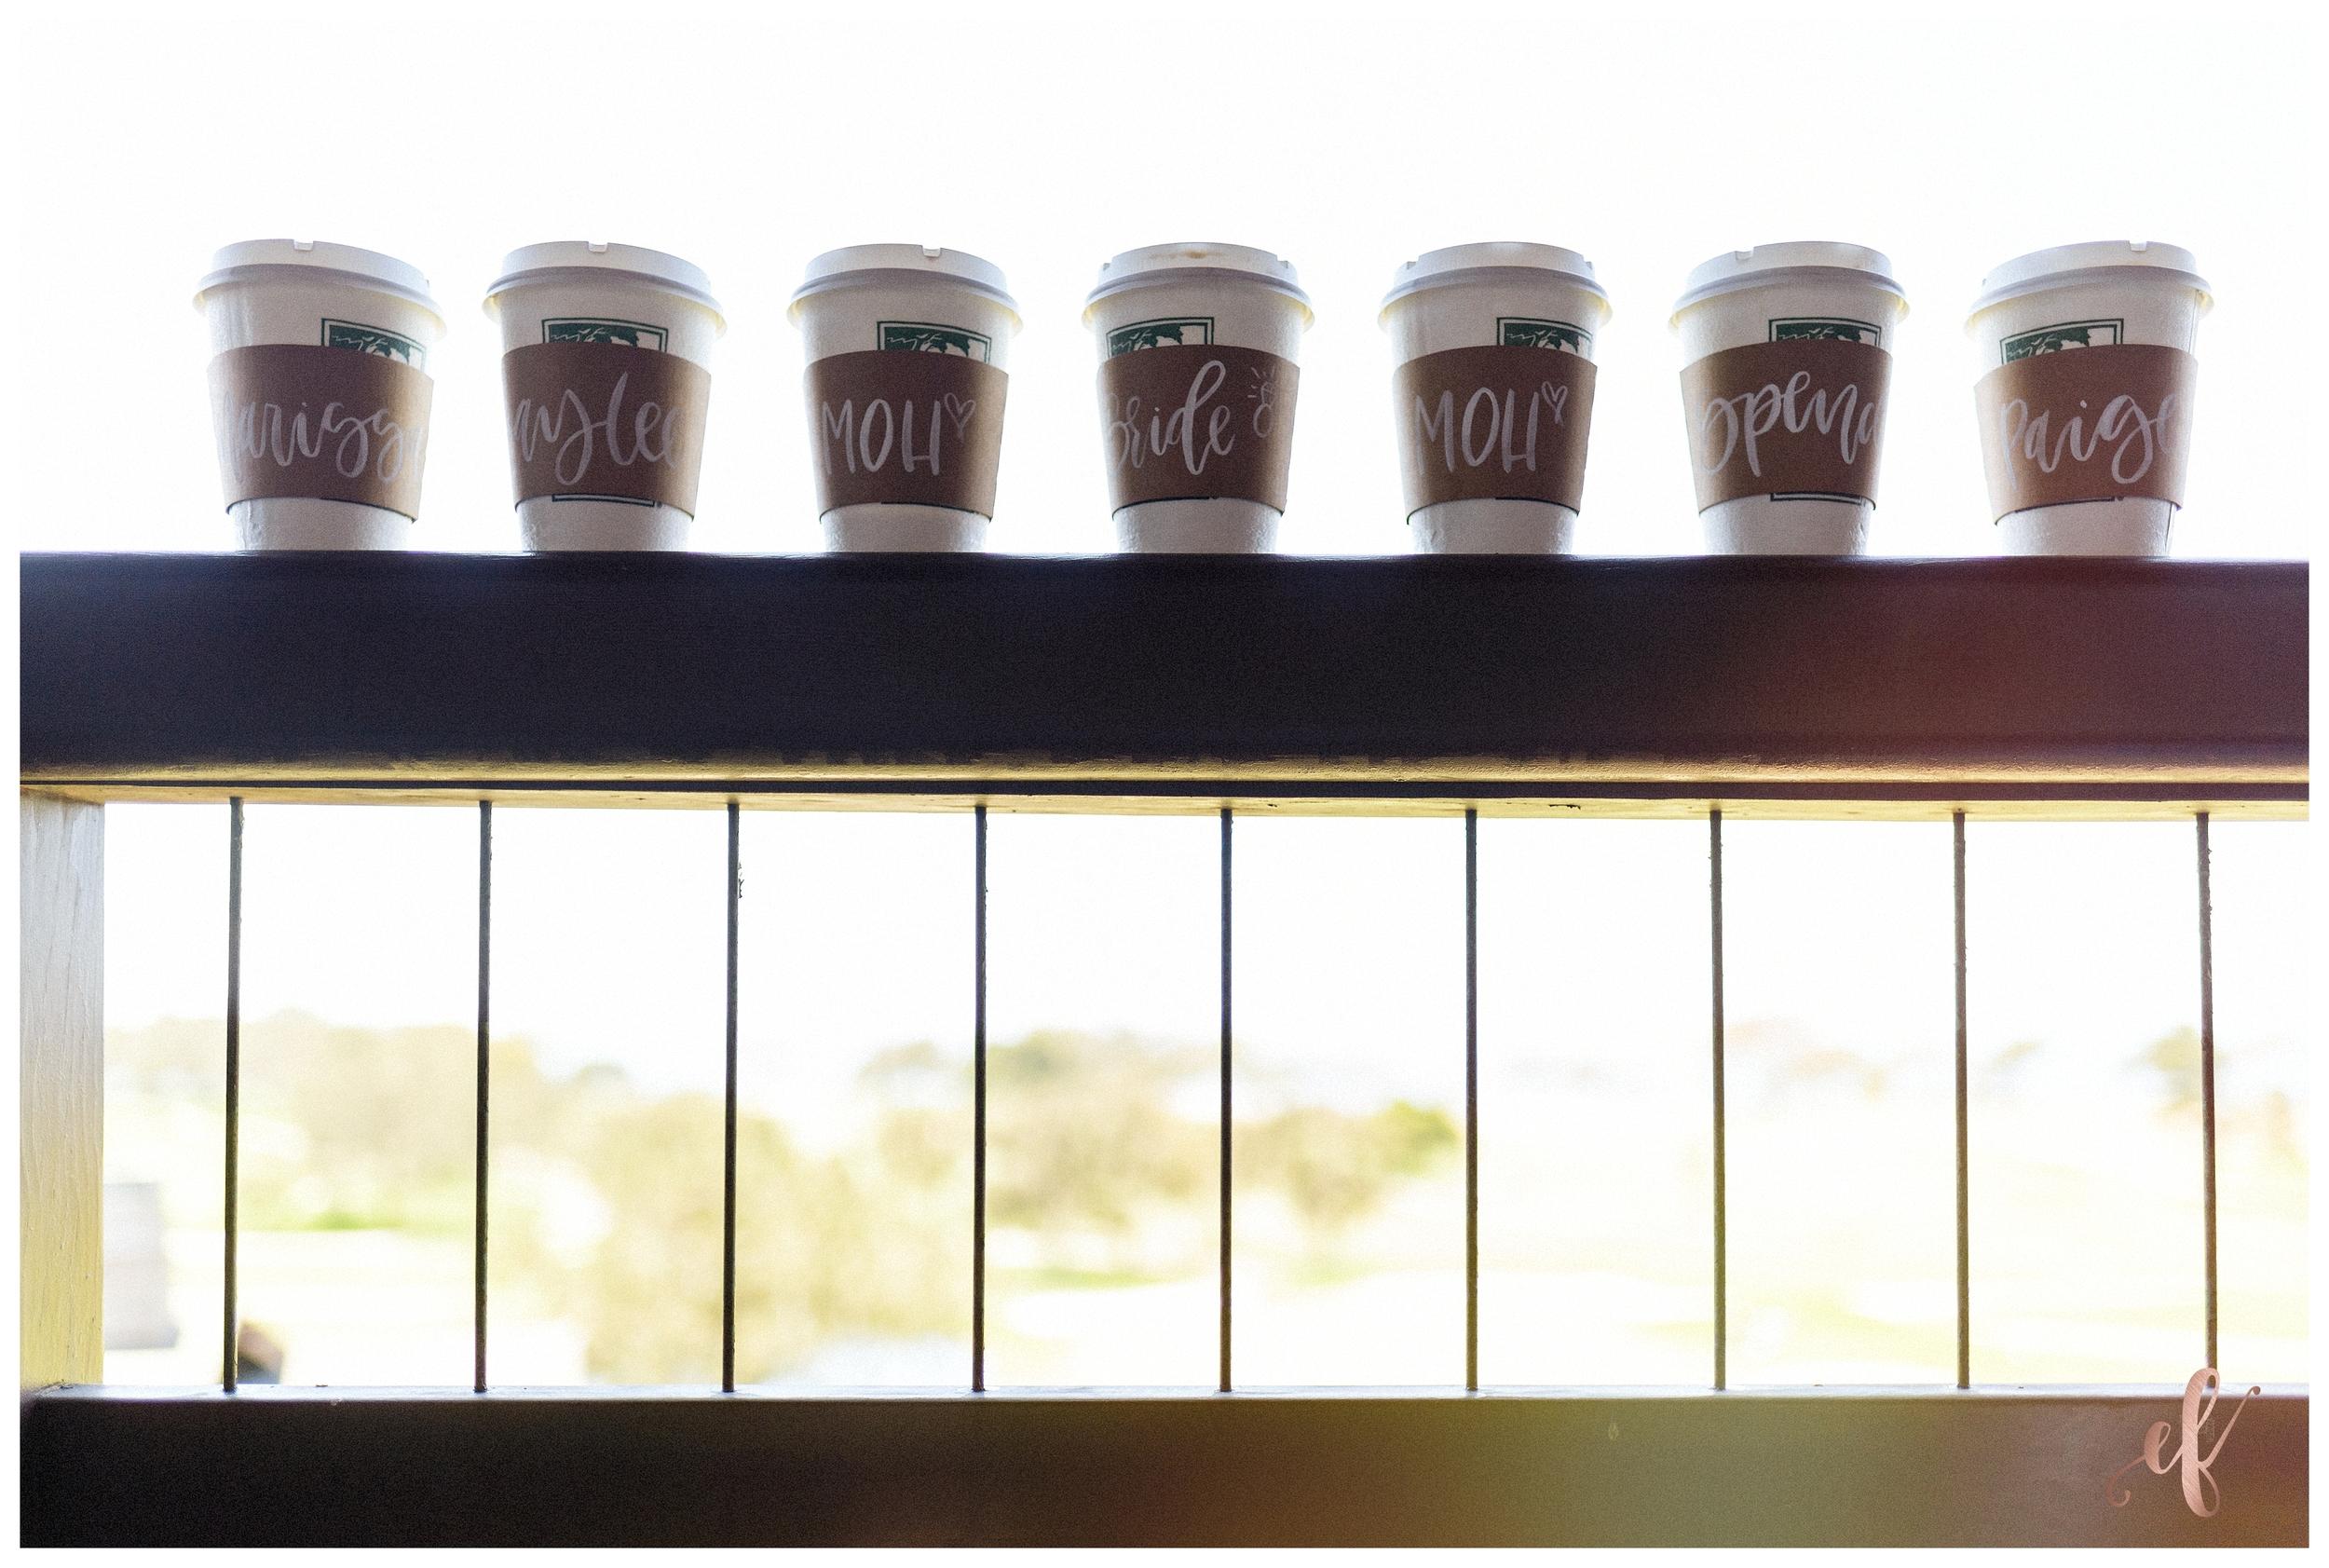 San Diego Wedding Photographer   Ernie & Fiona Photography   Bride   Bridesmaids   Starbucks Coffee cups